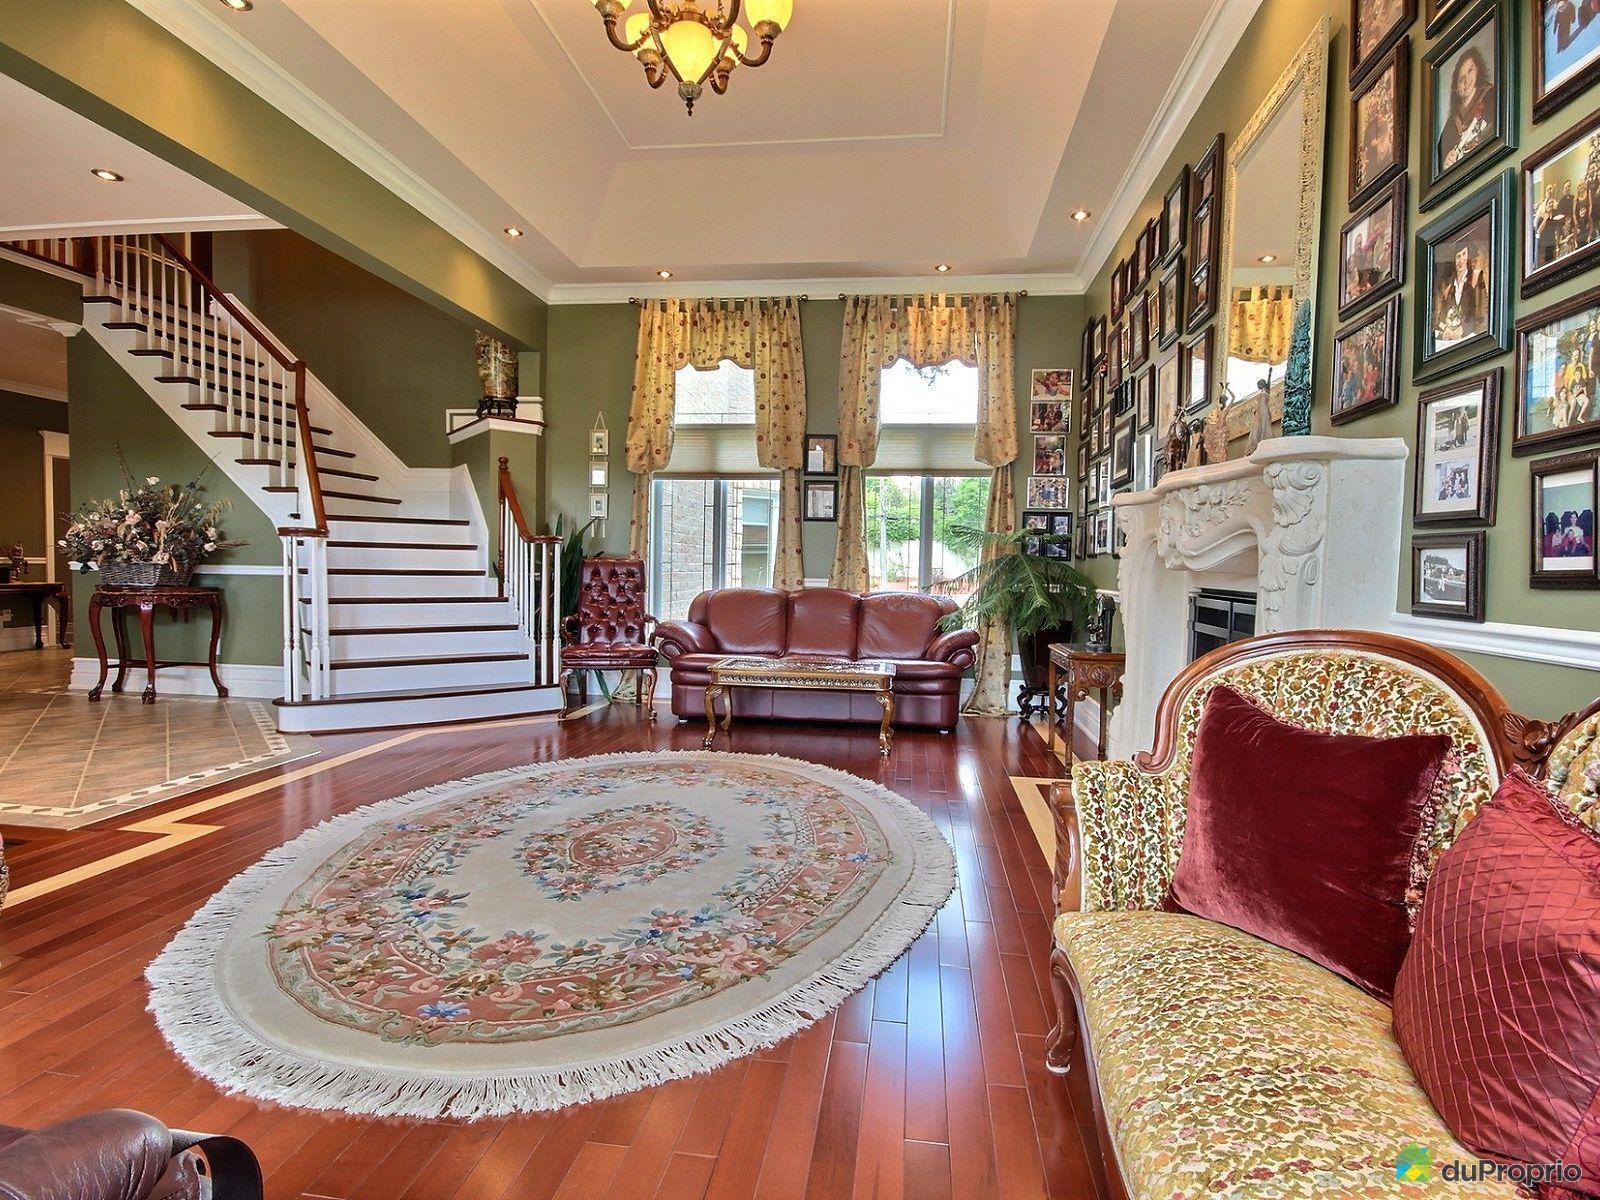 maison-a-vendre-gatineau-aylmer-quebec-province-1600-6353687.jpg